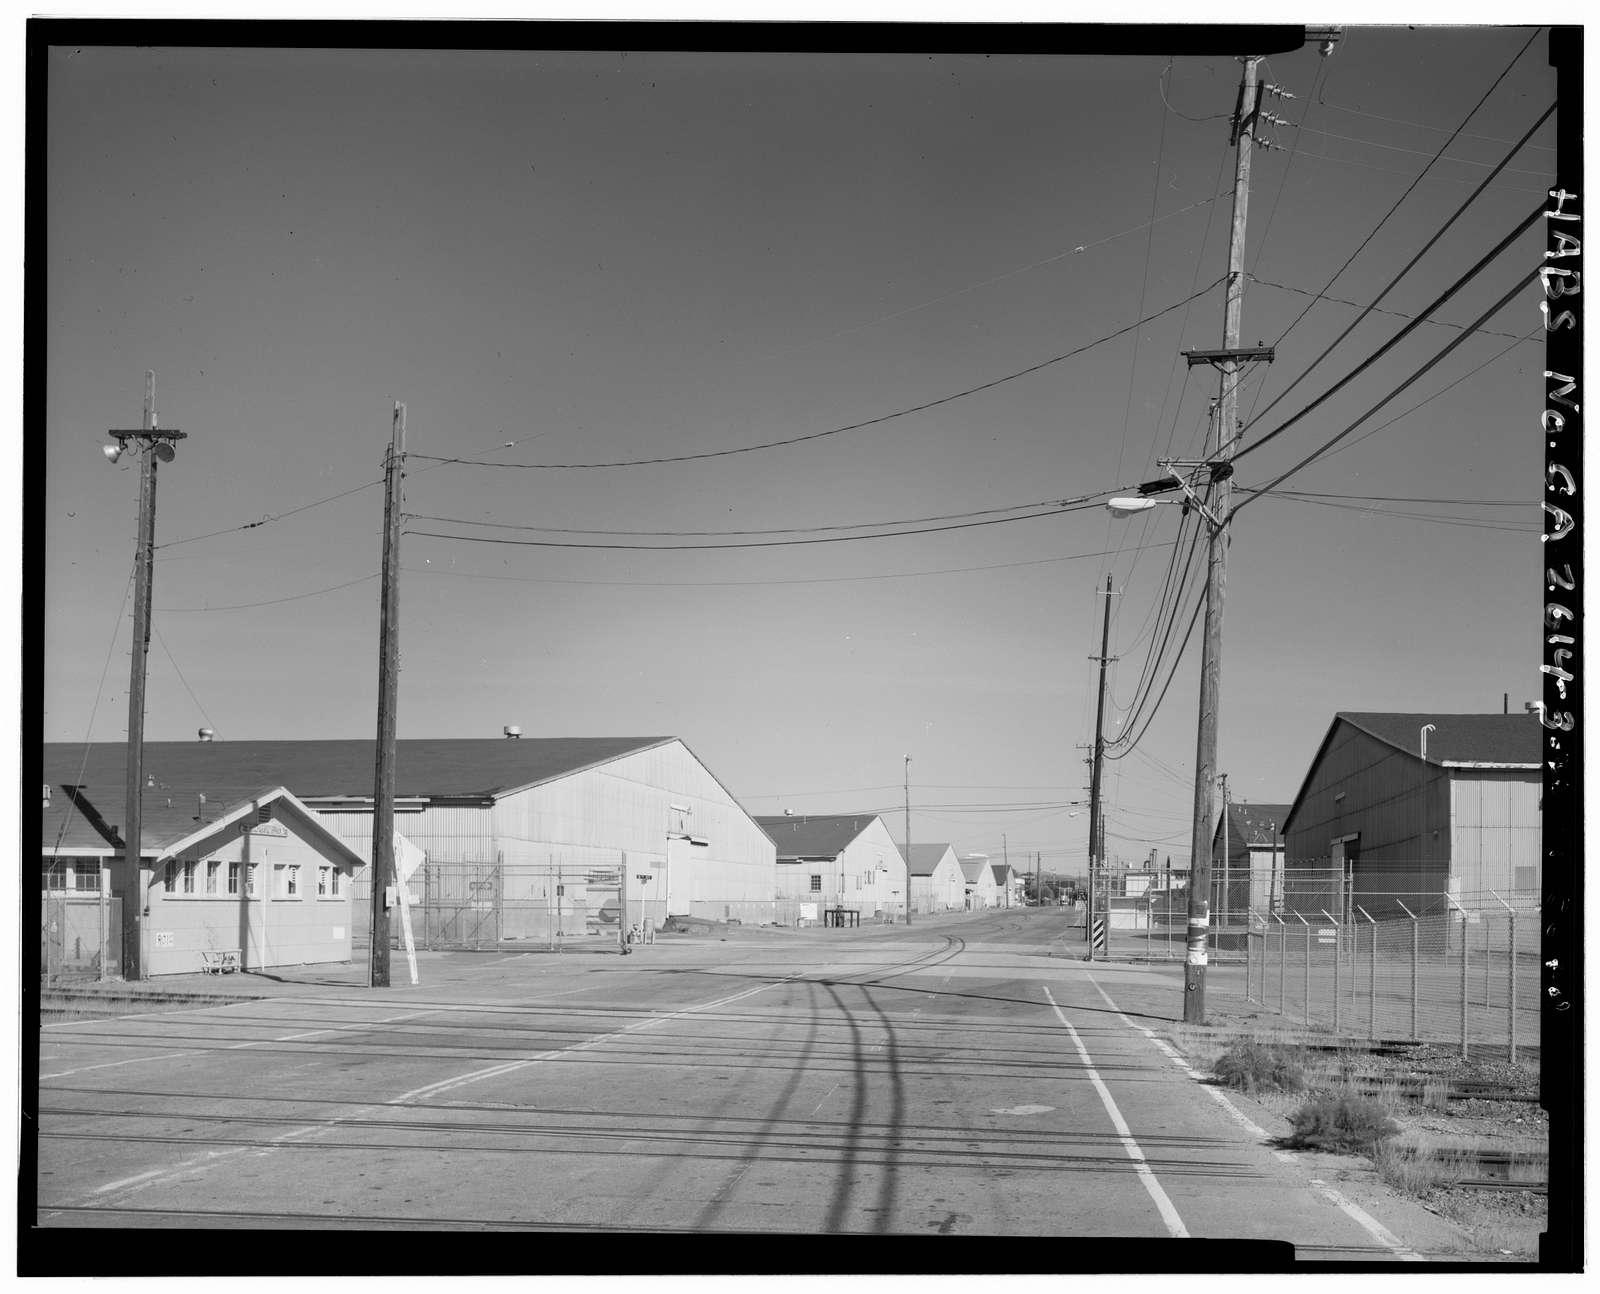 Oakland Naval Supply Center, Maritime Street at Seventh Street, Oakland, Alameda County, CA